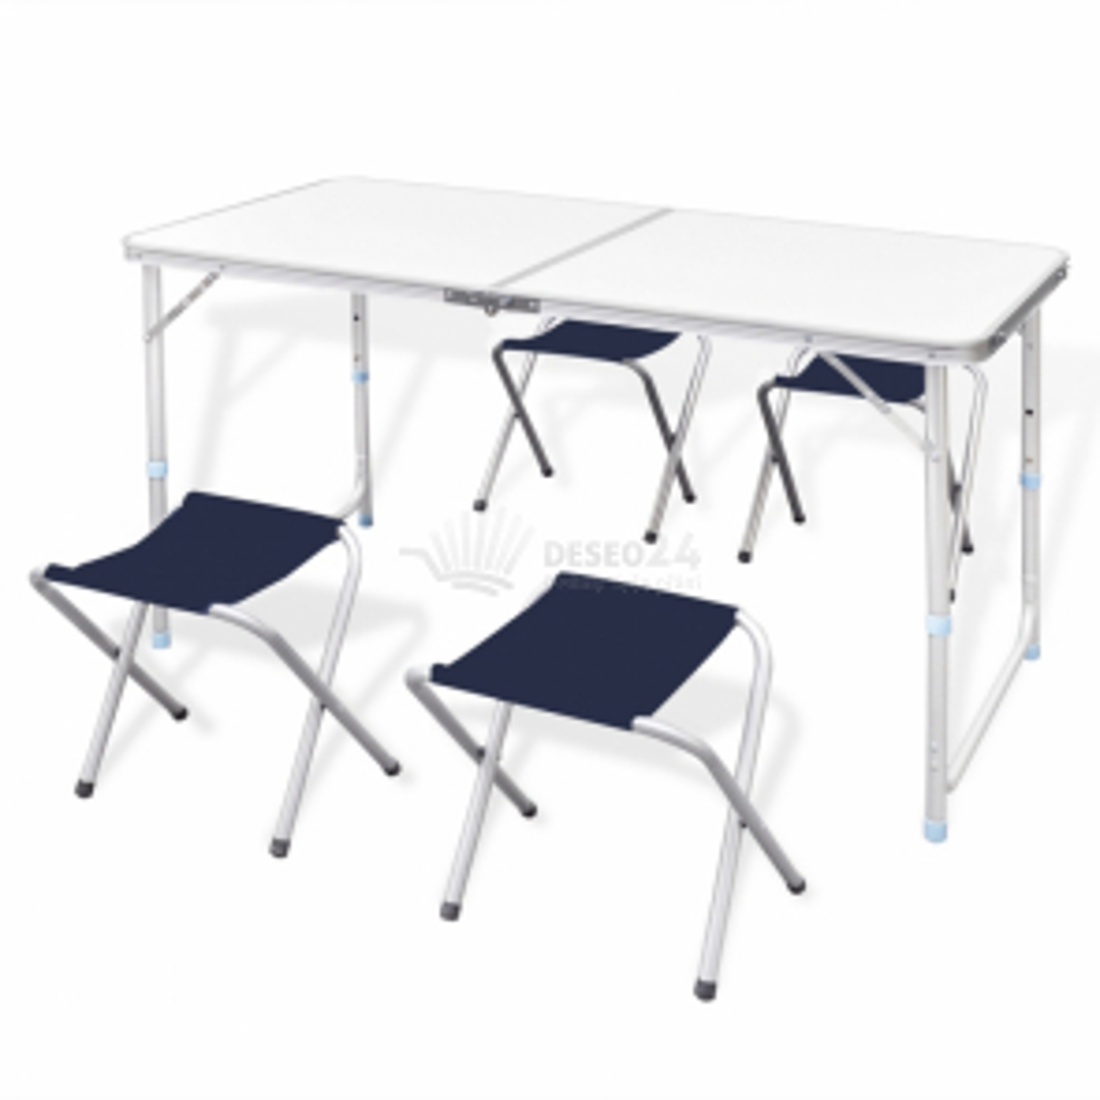 Skládací kempová sada stůl a 4 stoličky, nastavitelná výška 120x60 cm